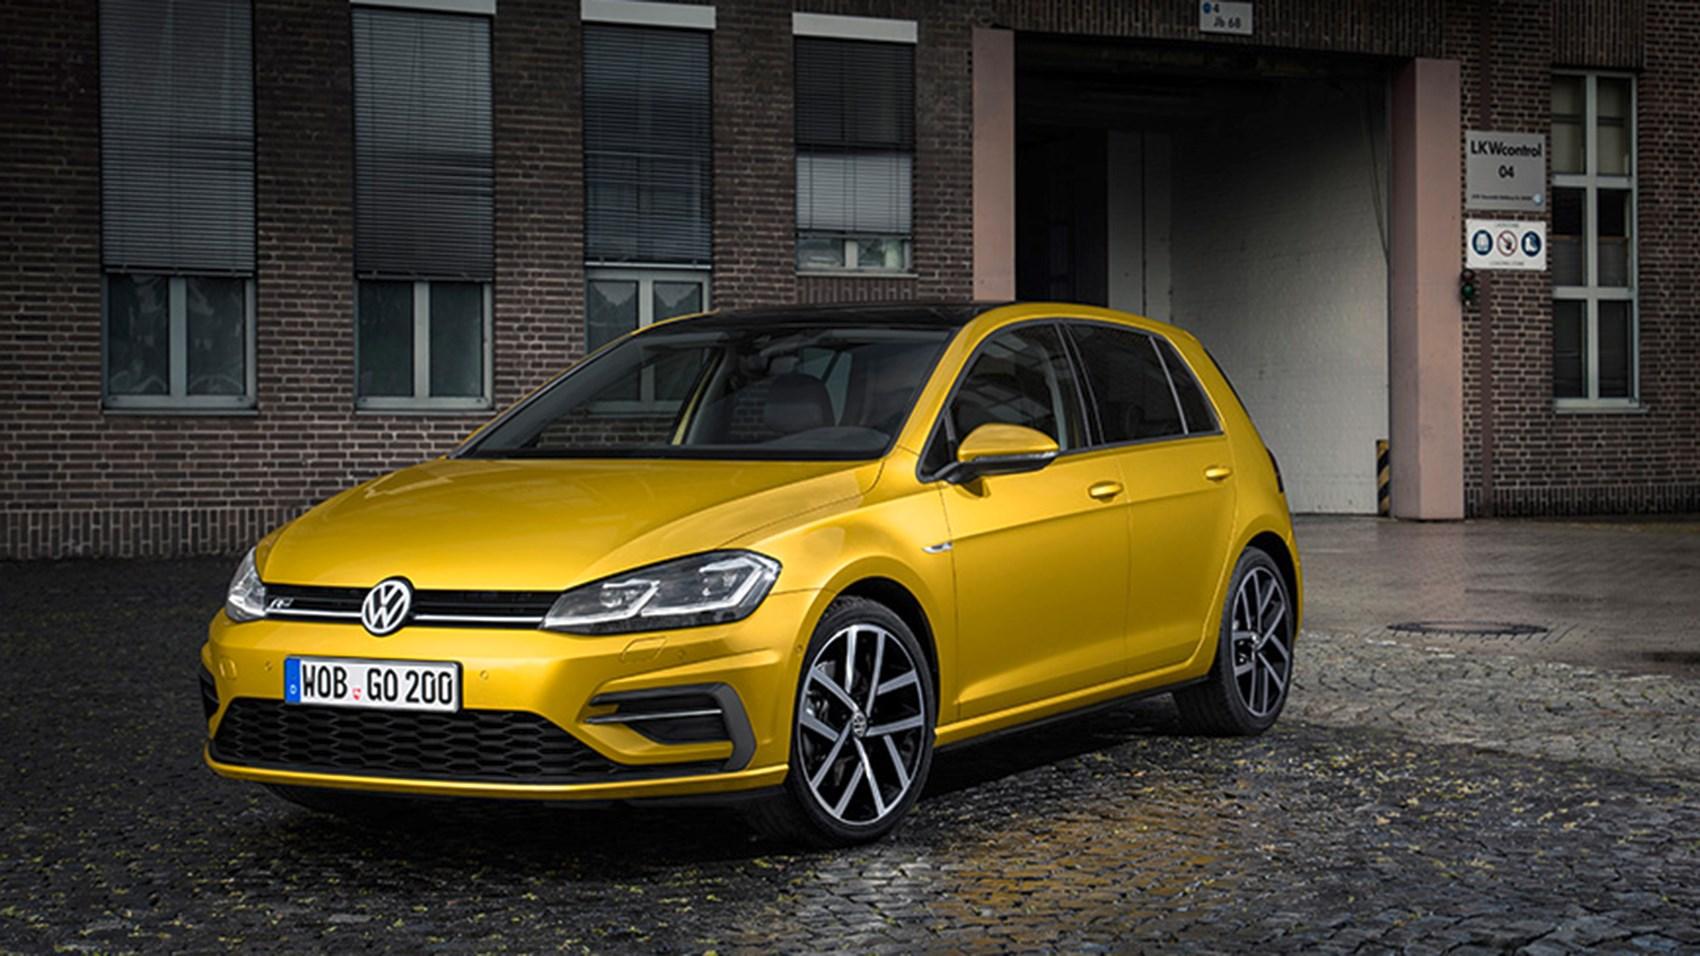 Volkswagen golf 2 0 tdi kokemuksia